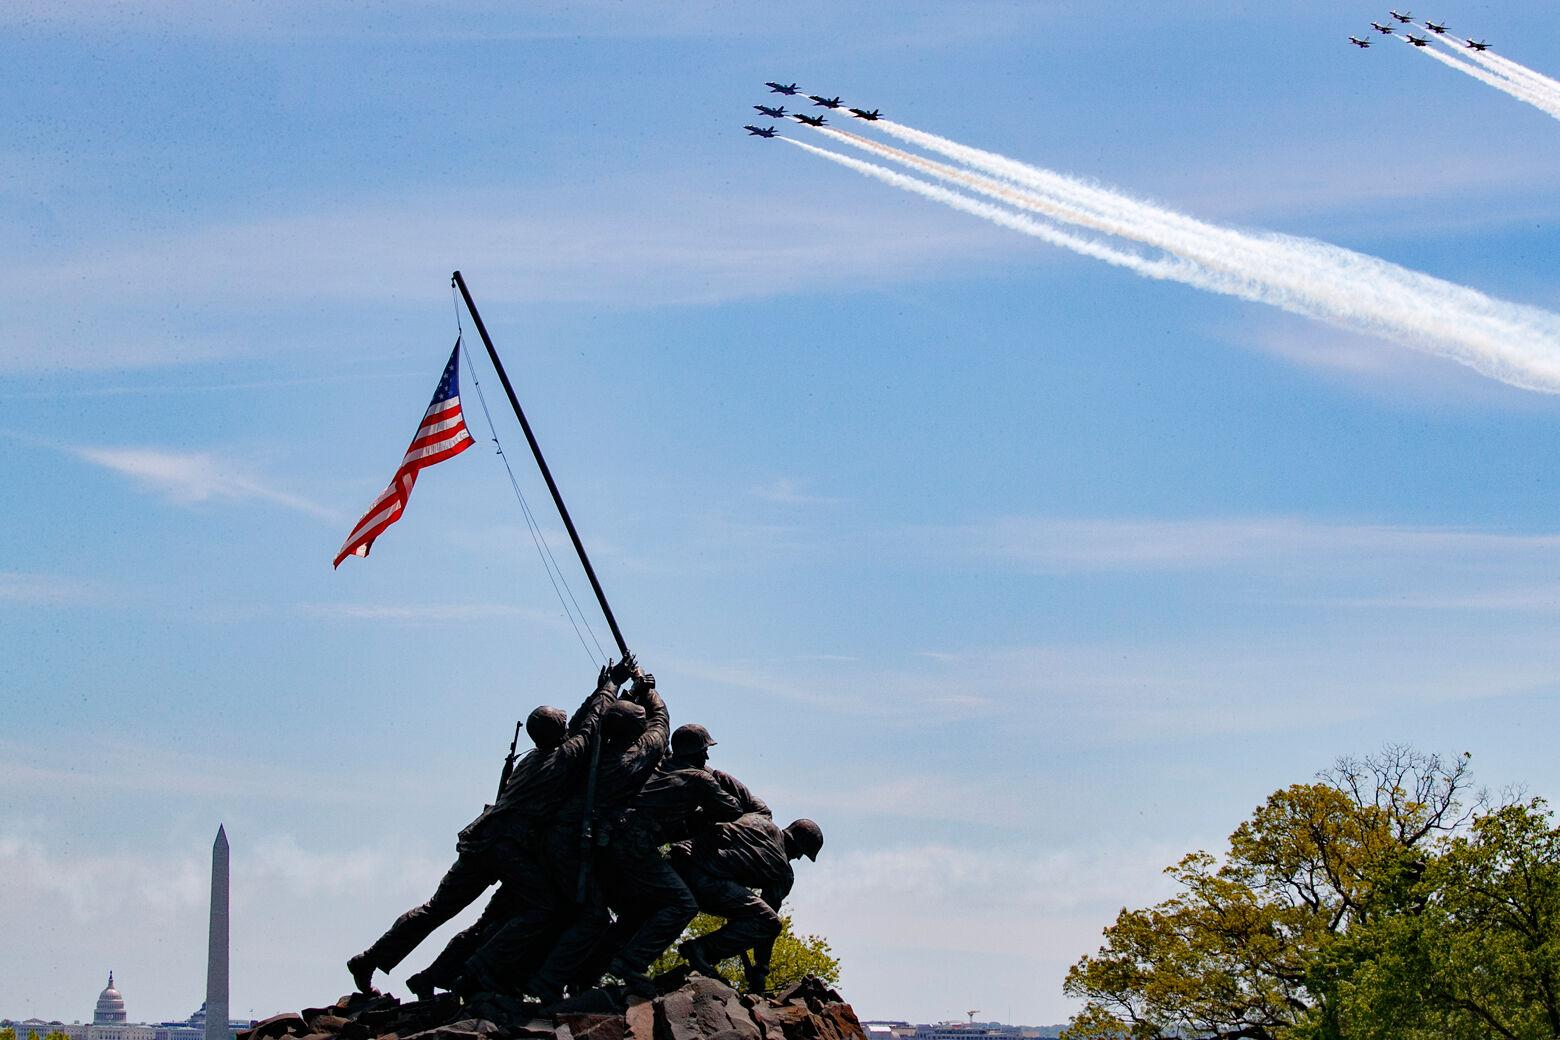 Jets above the U.S. Marine Corps War Memorial.